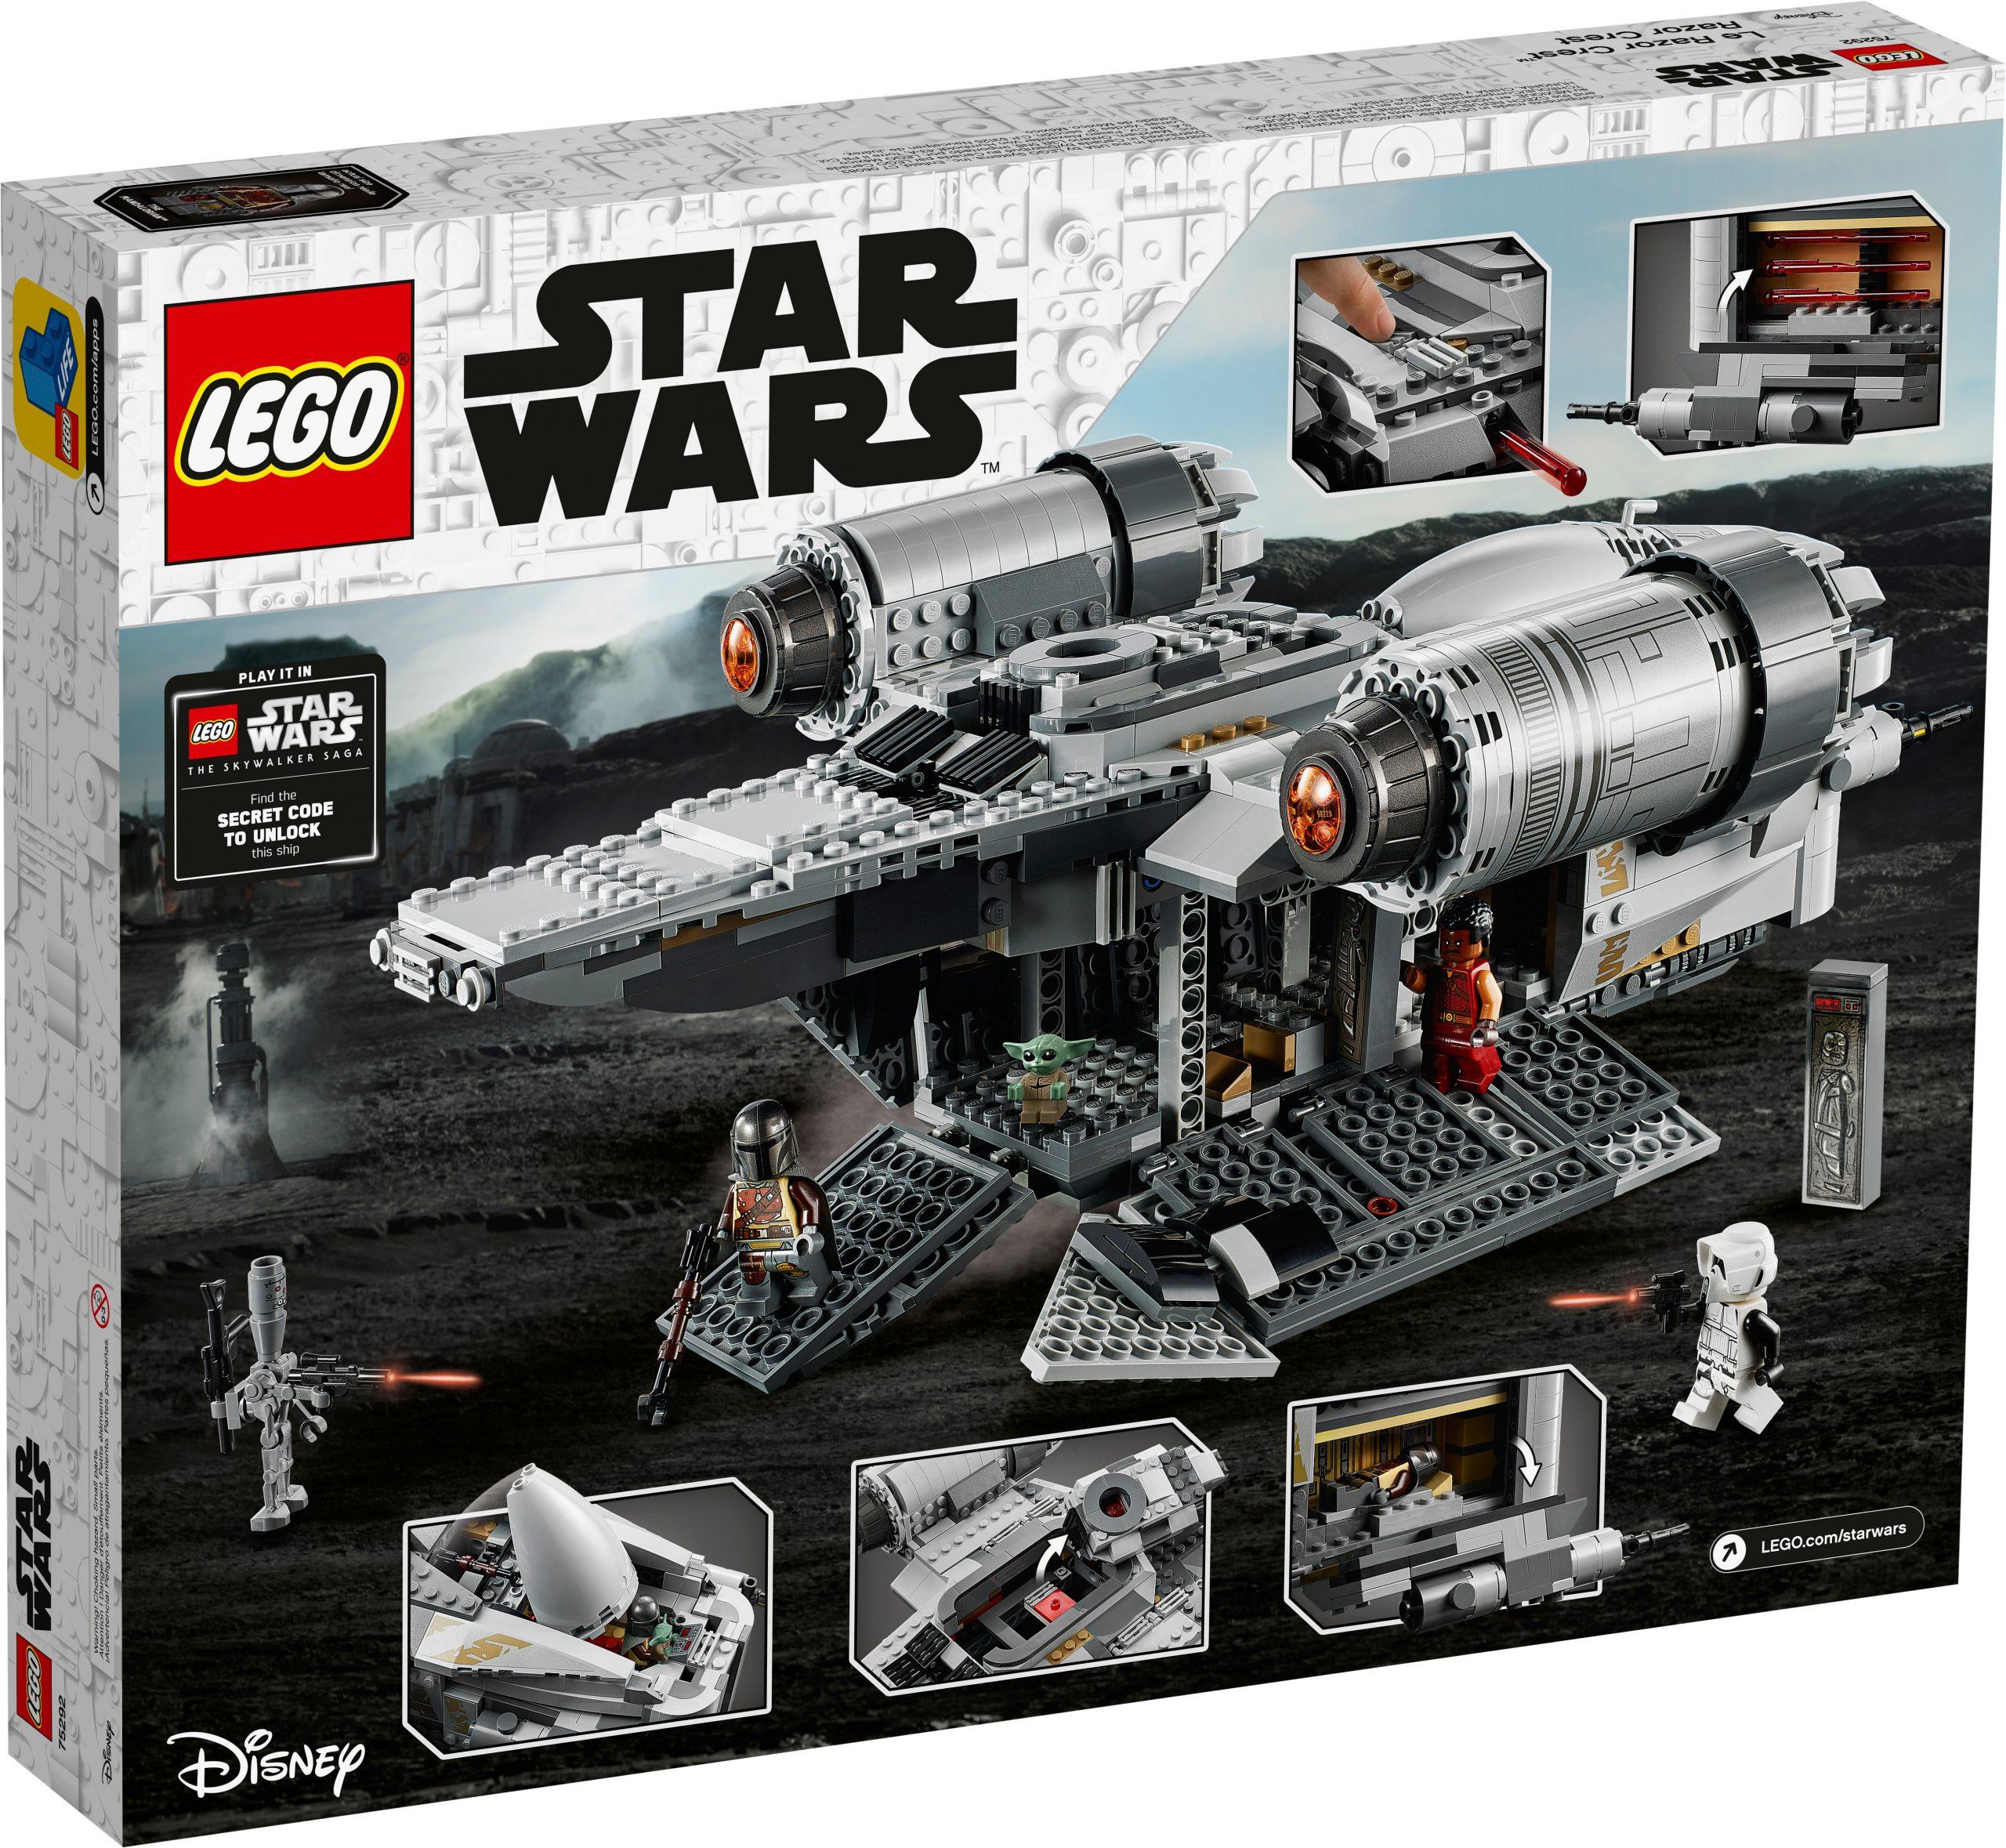 lego-star-wars-mandalorian-razor-crest-75292-box-back-2020 zusammengebaut.com